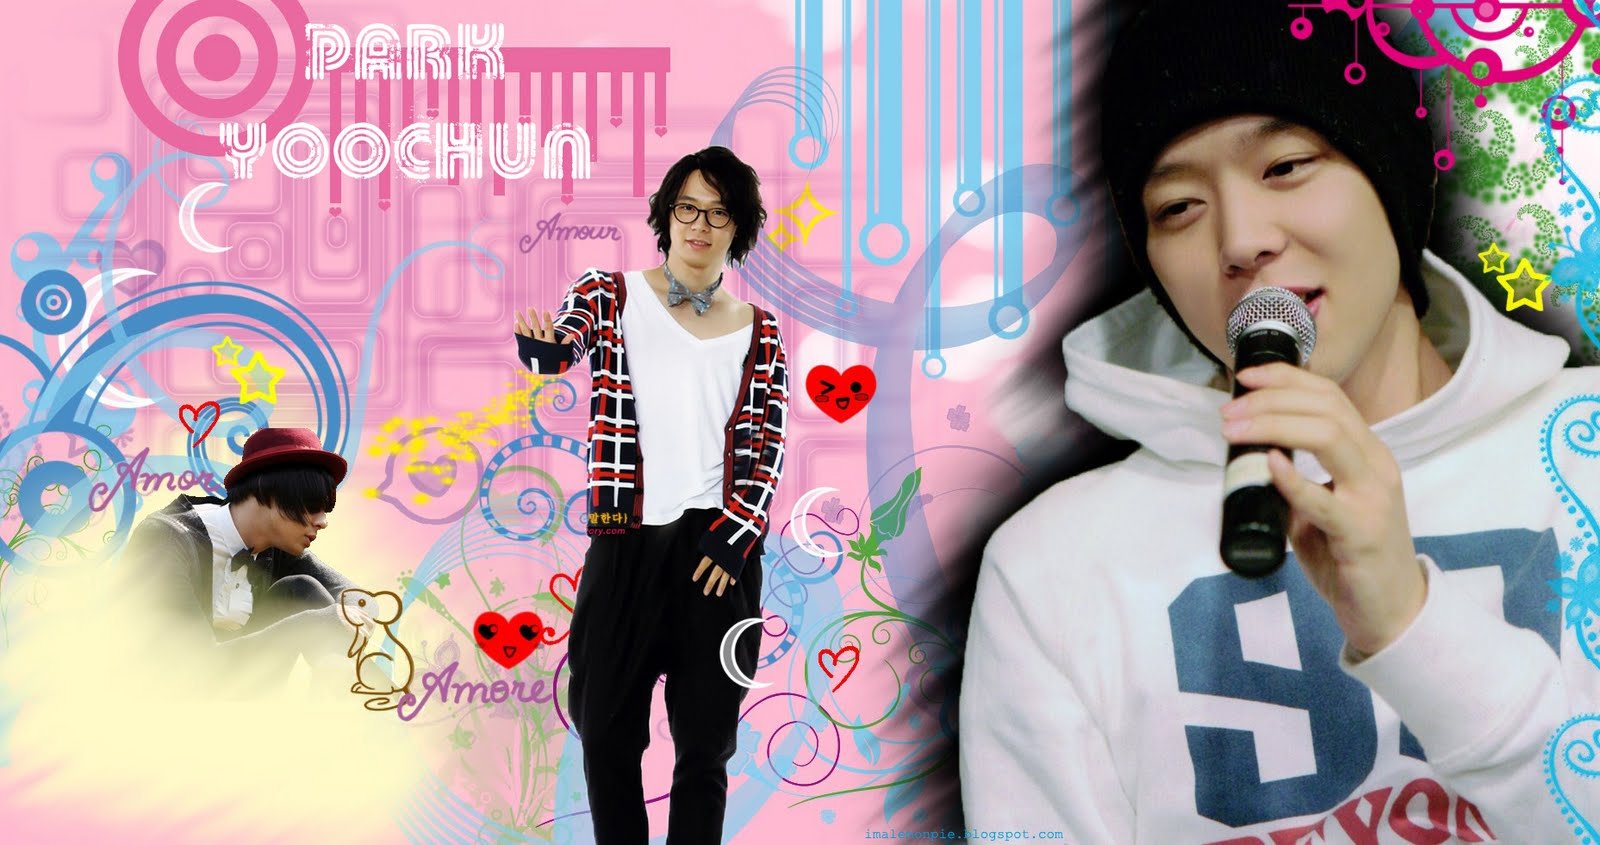 http://4.bp.blogspot.com/_l9Wy-RJRDqc/S9a111iUiJI/AAAAAAAACDg/AsjEd8-asWM/s1600/chun+wall1.jpg